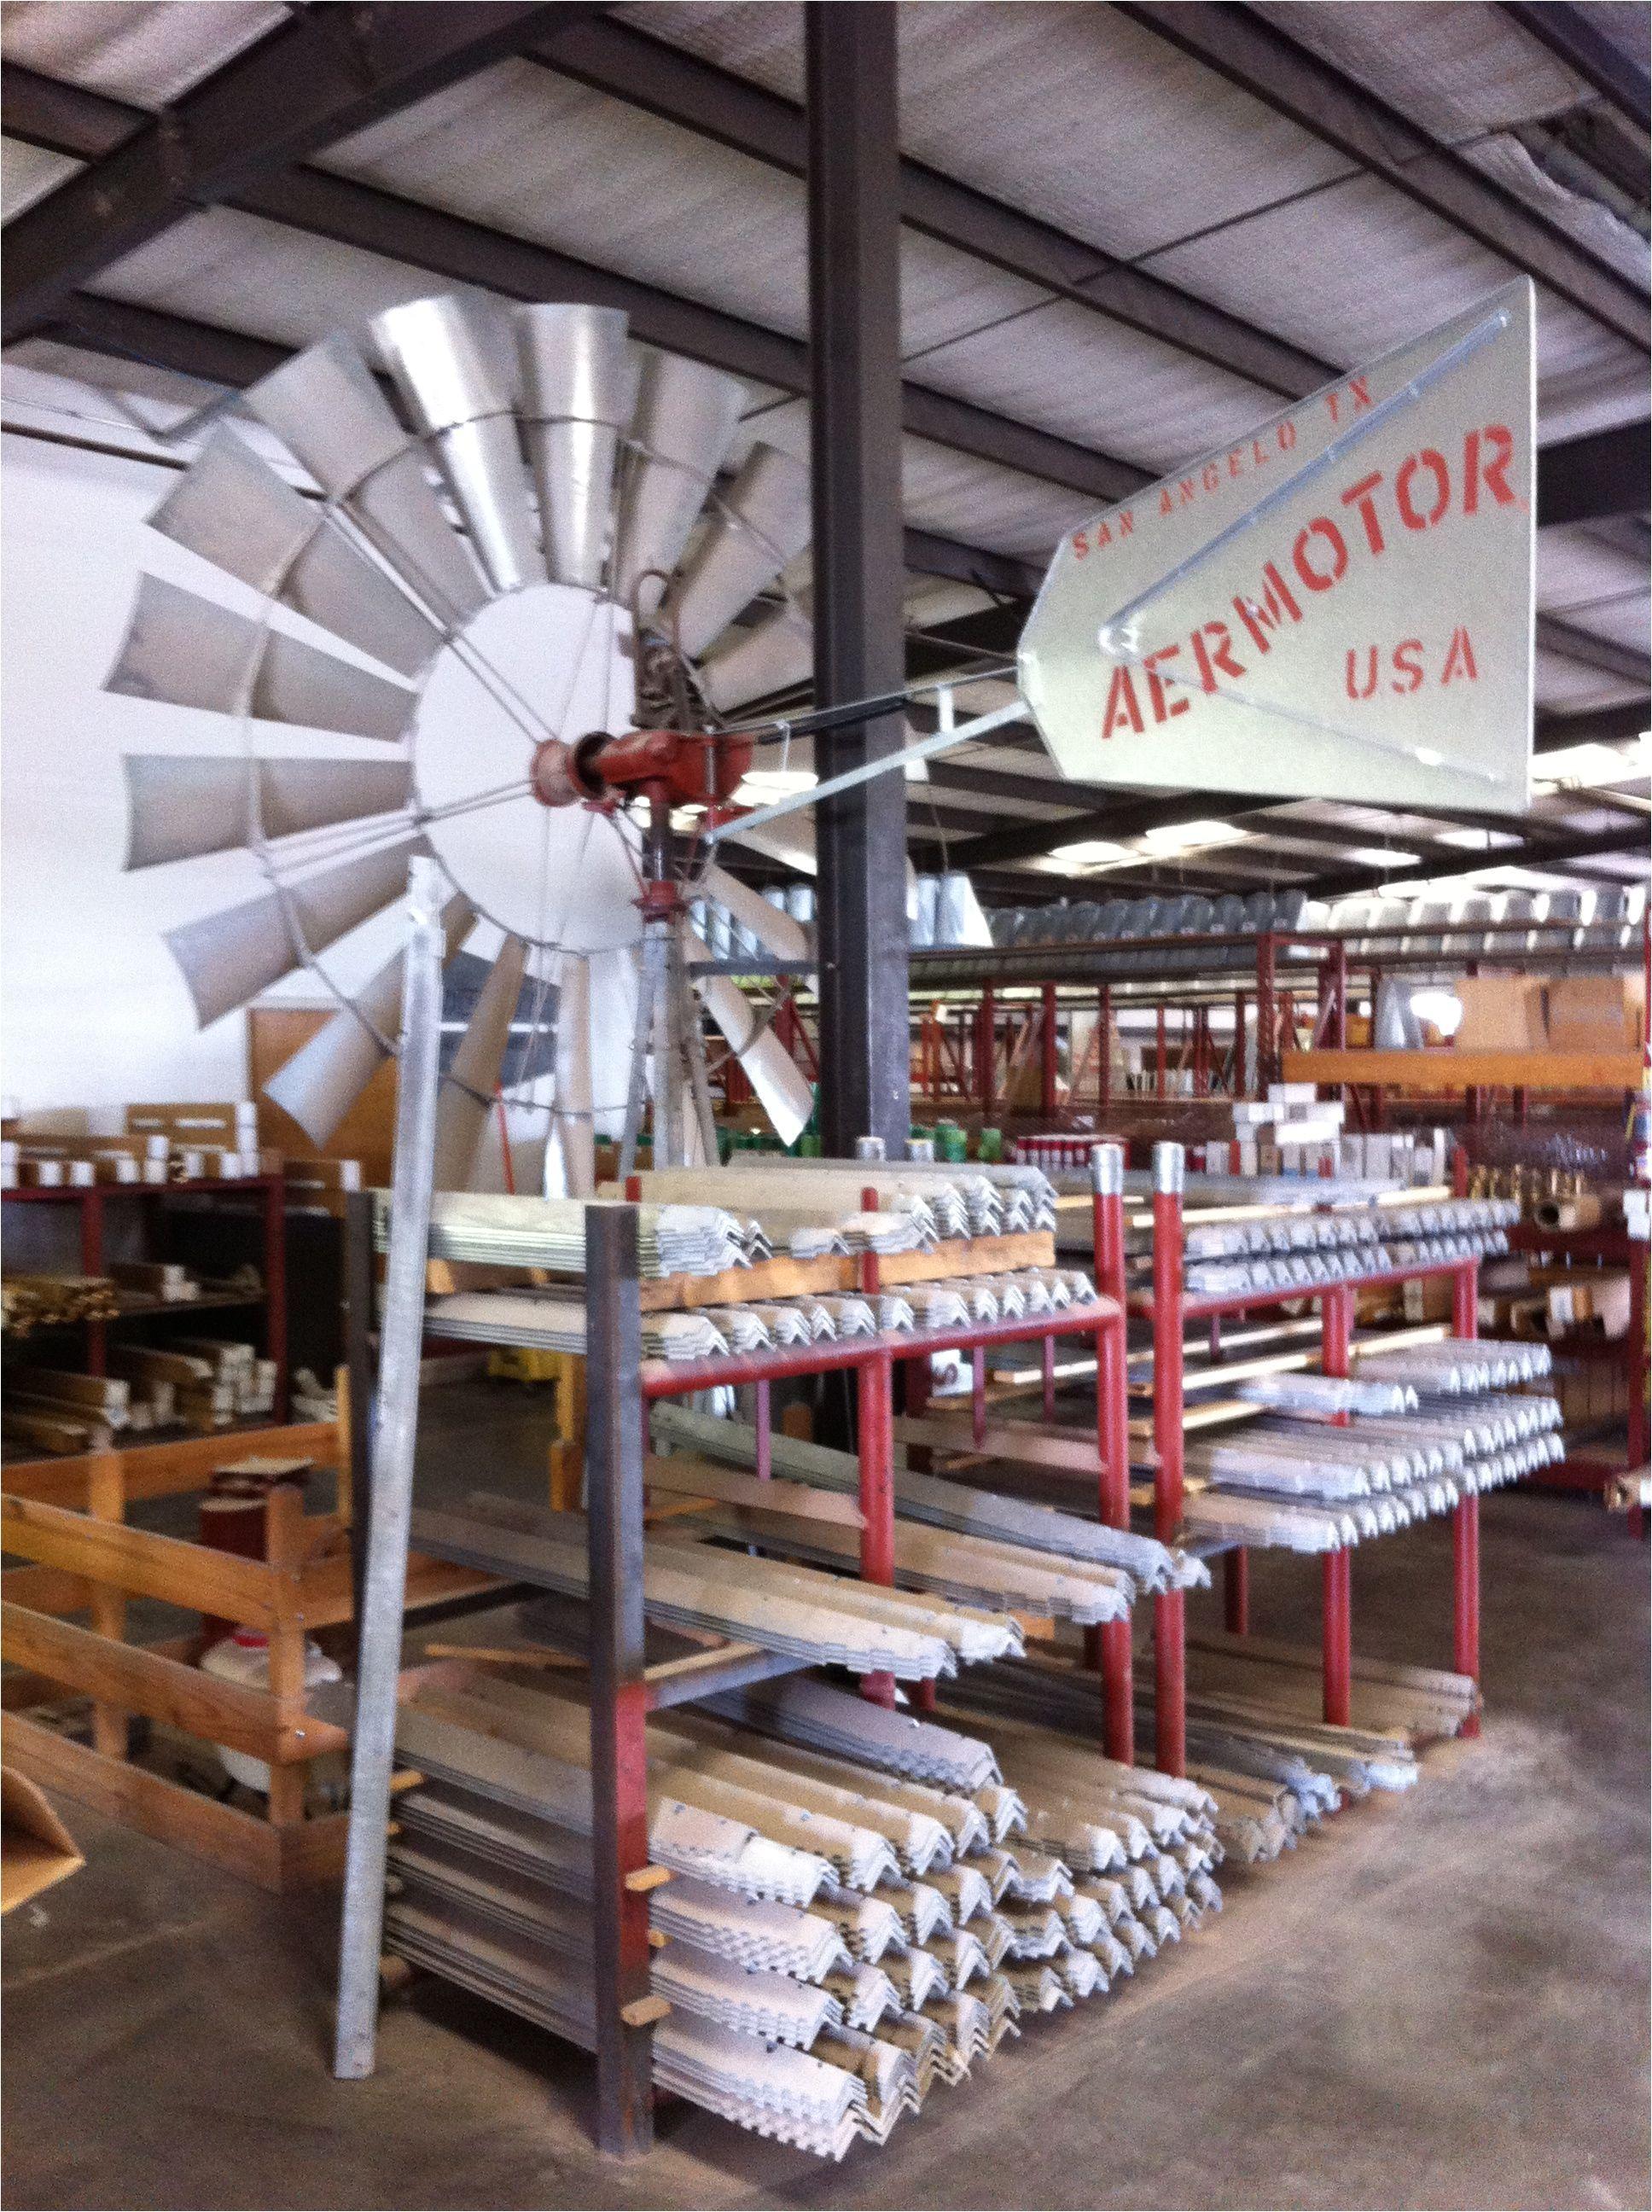 19th century windmill company seeks 21st century customers